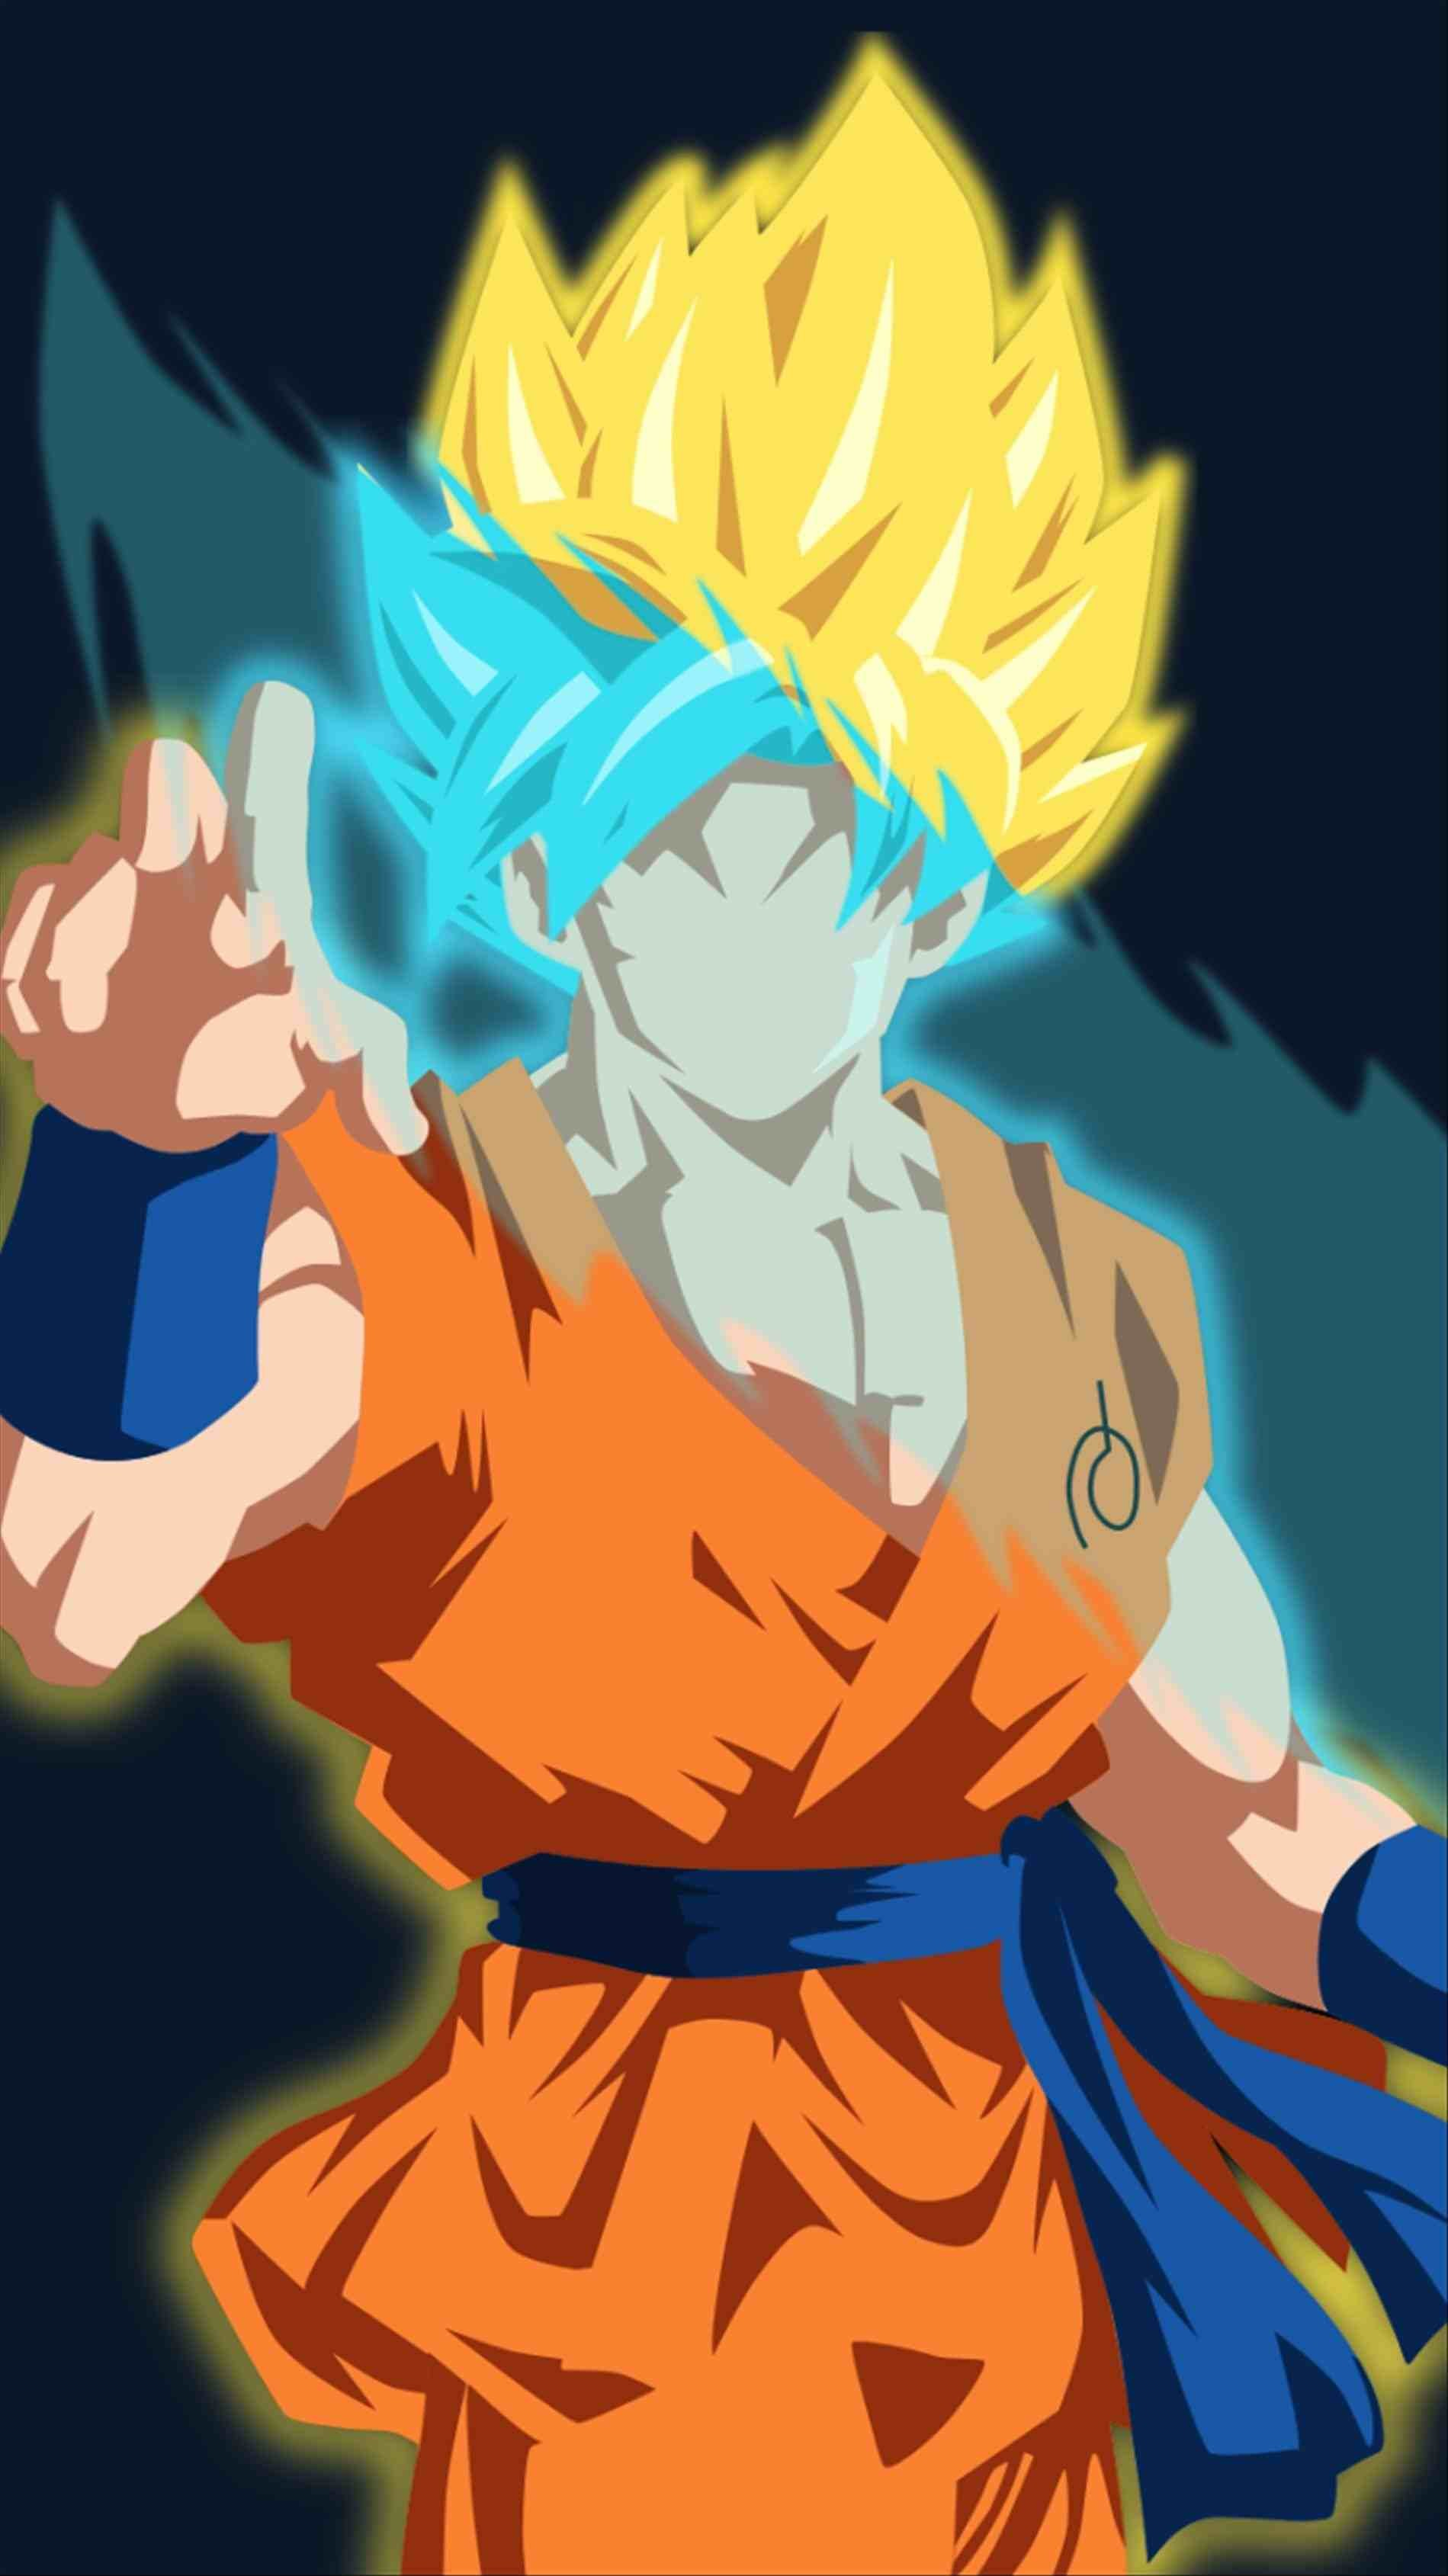 1899x3379 Super Id Windows Super Saiyan Blue Goku Goku Super Saiyan Wallpaper Iphone 7 1899x3379 Download Hd Wallpaper Wallpapertip